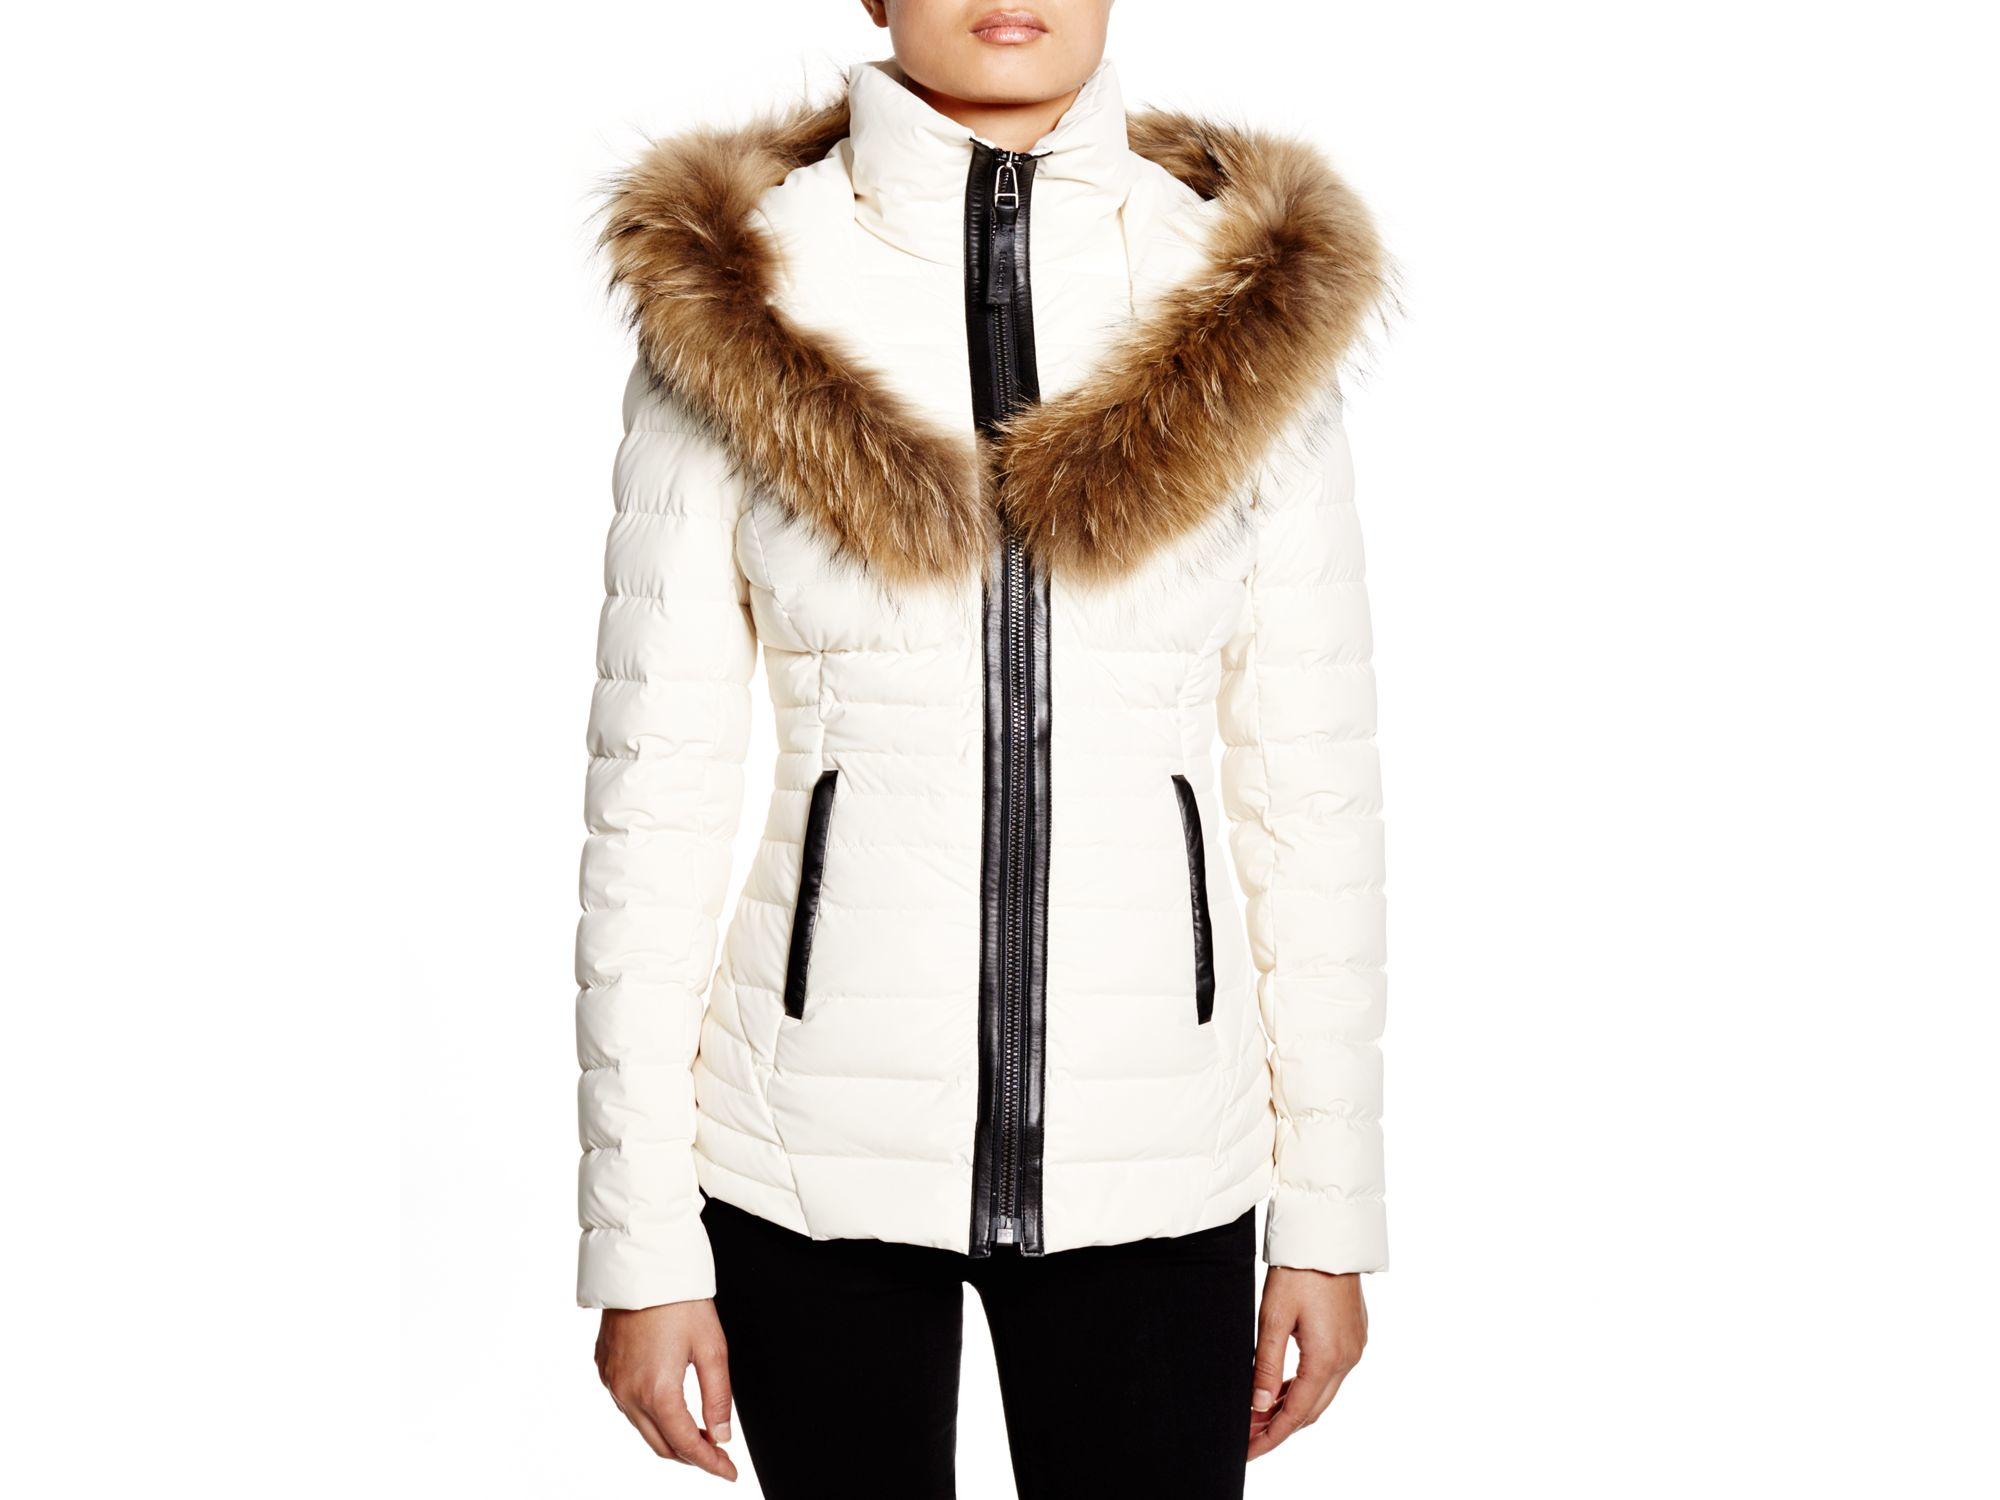 f64799756 where to buy mackage white coat 4b71d e6c30